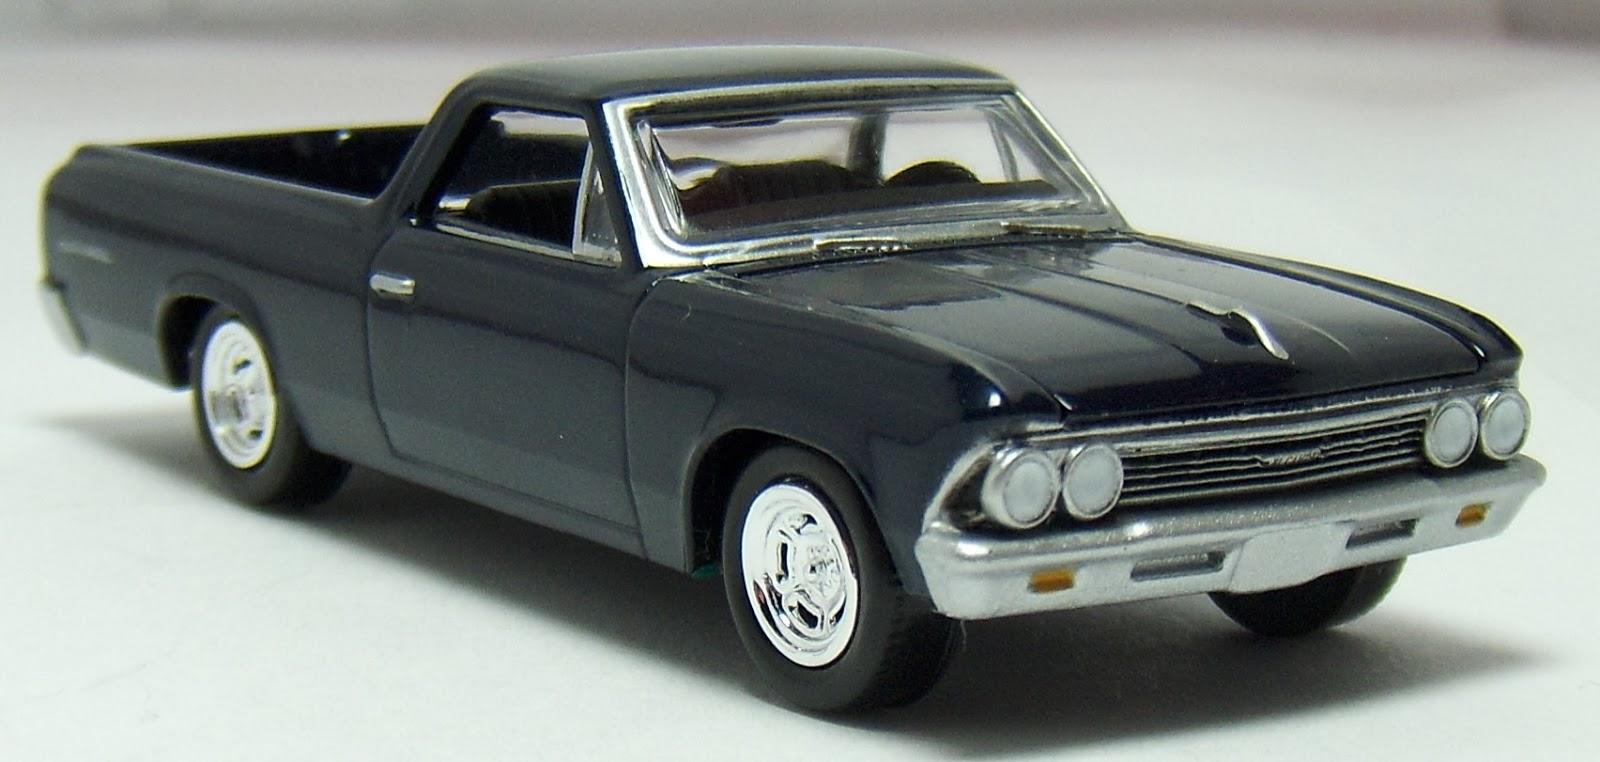 hight resolution of auto world 1966 chevrolet el camino